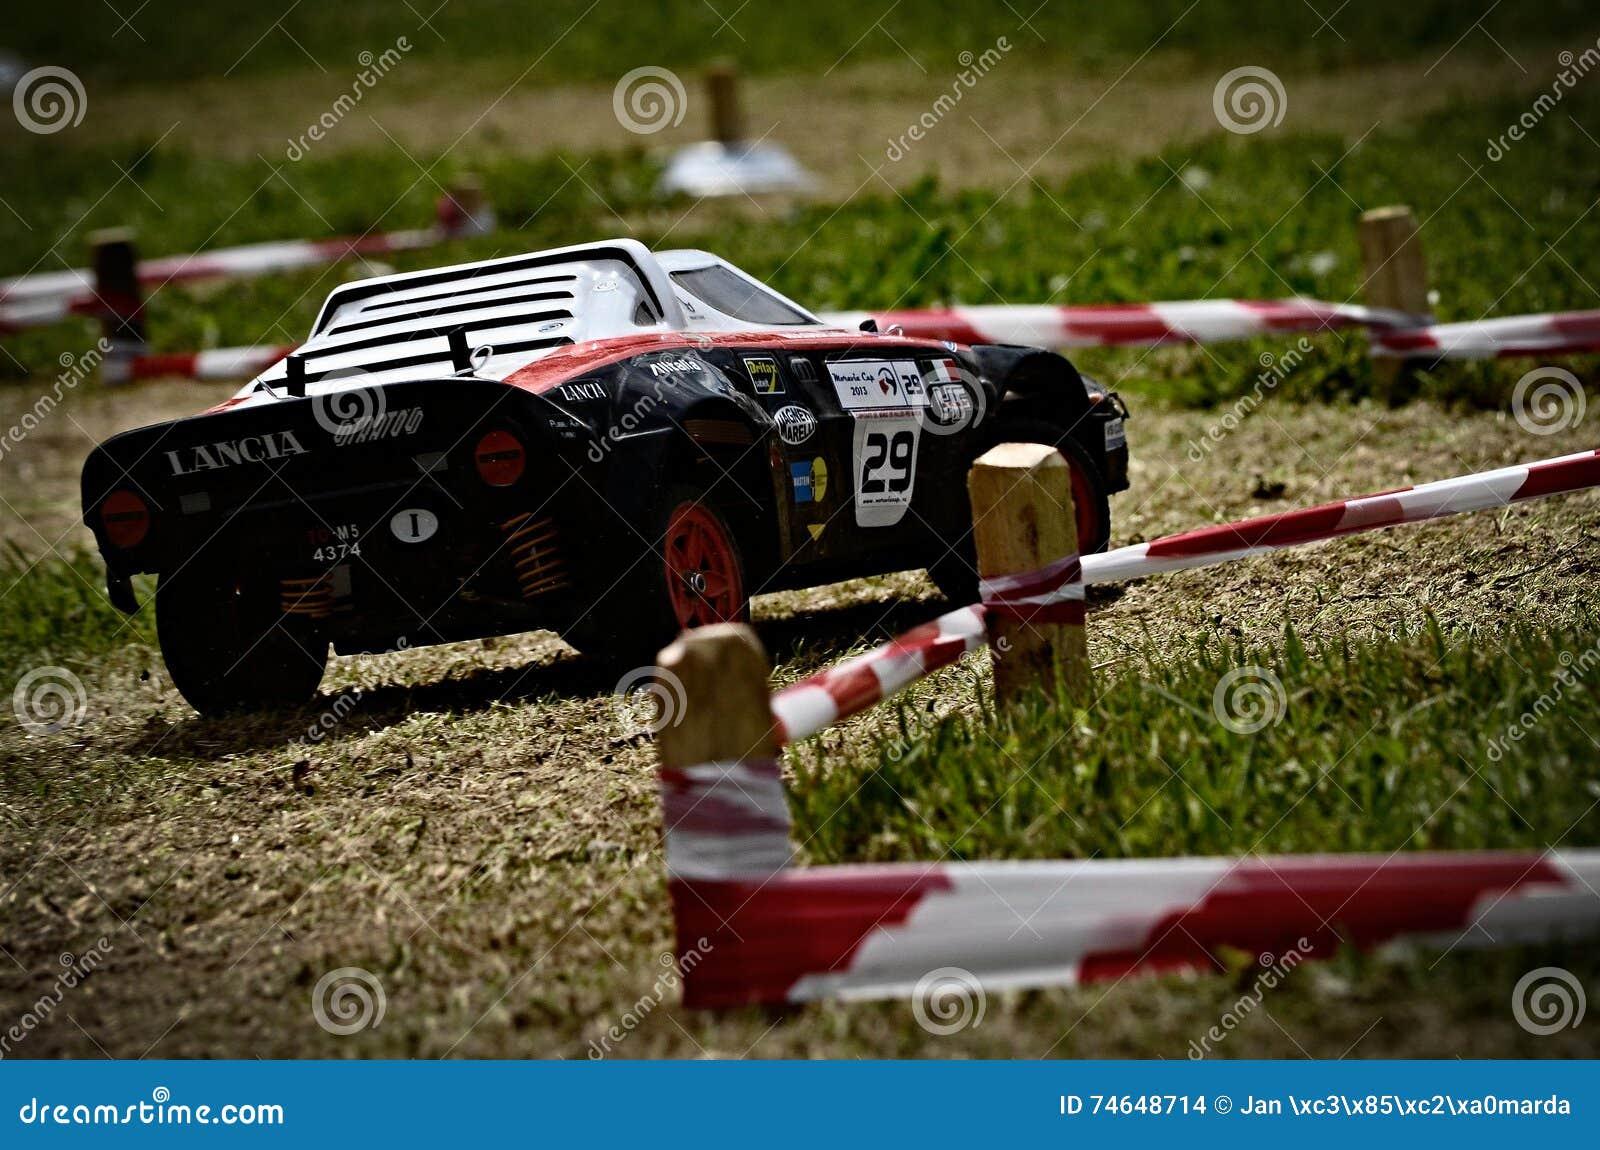 Rc Rally Car Stock Photo 74648714 - Megapixl